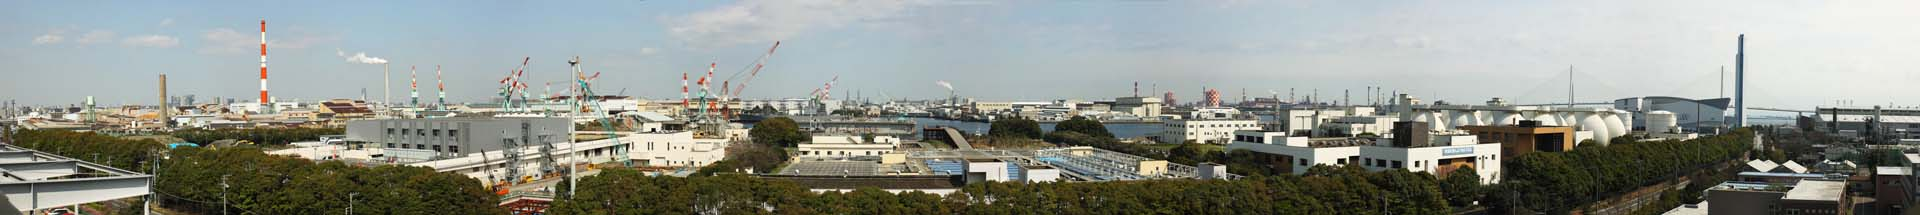 foto,tela,gratis,paisaje,fotograf�a,idea,Visualizaci�n entera de �rea industrial de Kawasaki, Chiminea, F�brica, Astillero, Gr�a